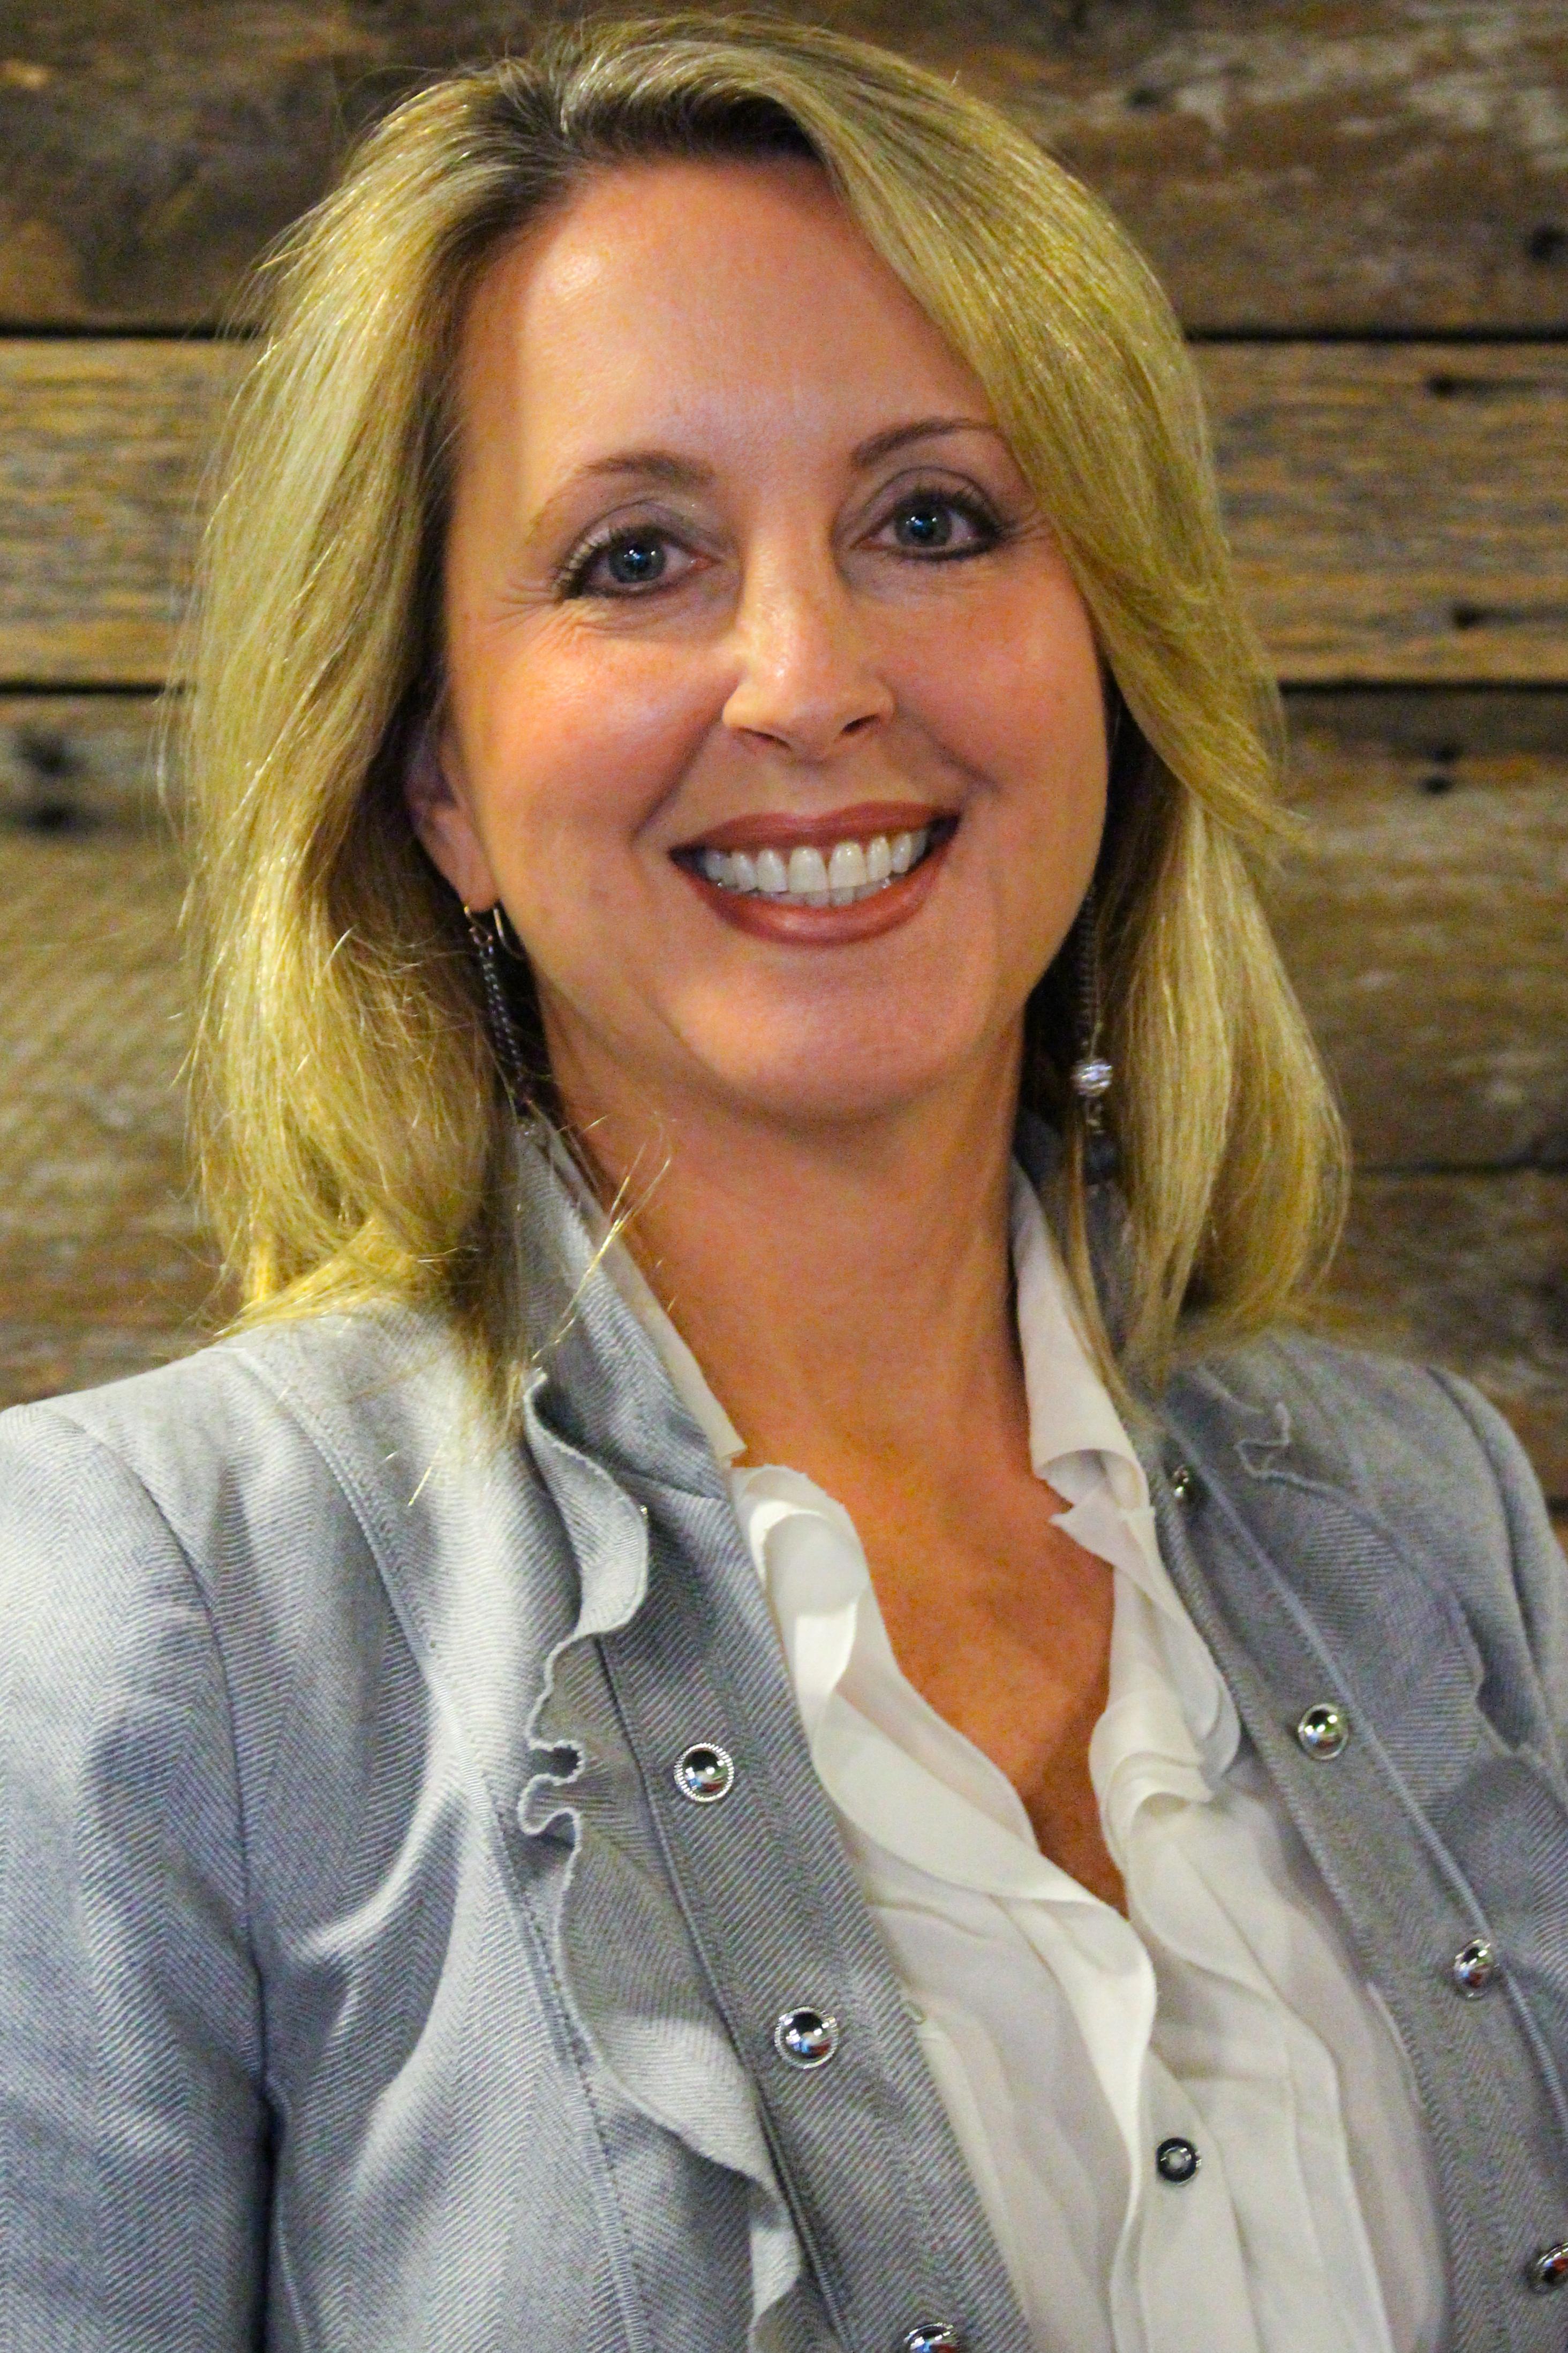 Renee Shafer